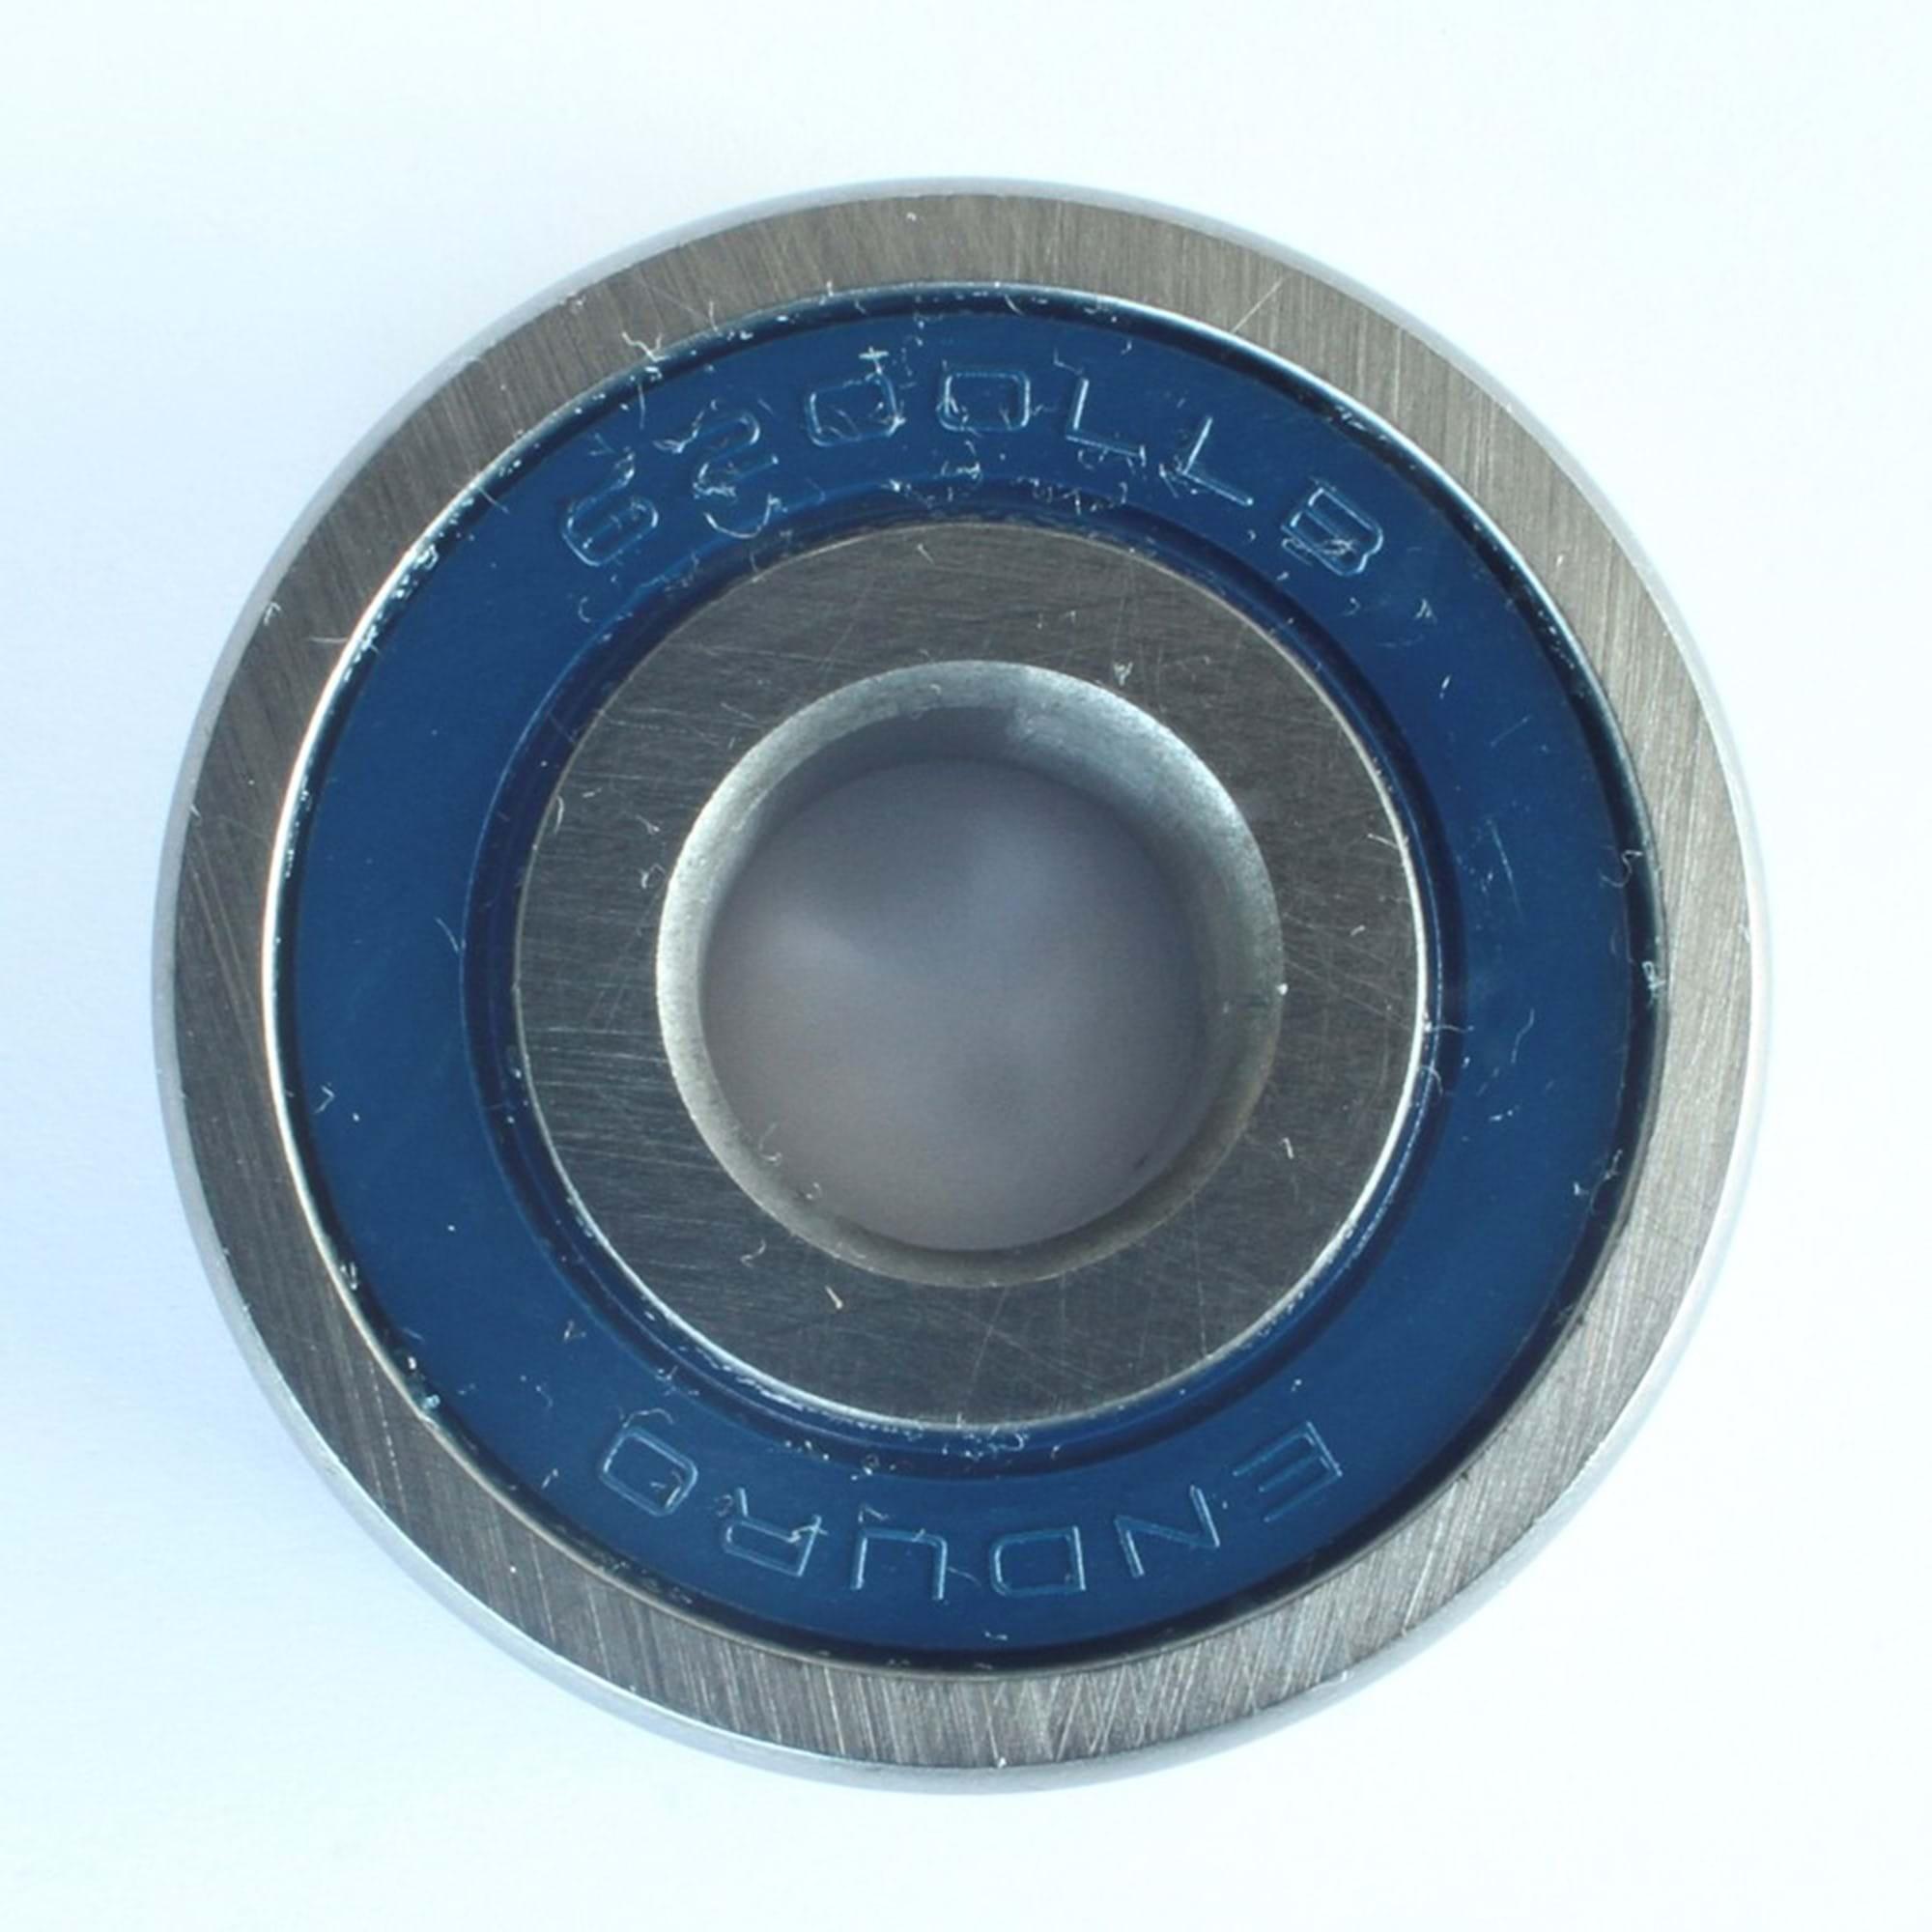 Kugleleje Enduro 6200-2RS ABEC3 LLB (30x10x9) - EB8010 | Bottom brackets bearings